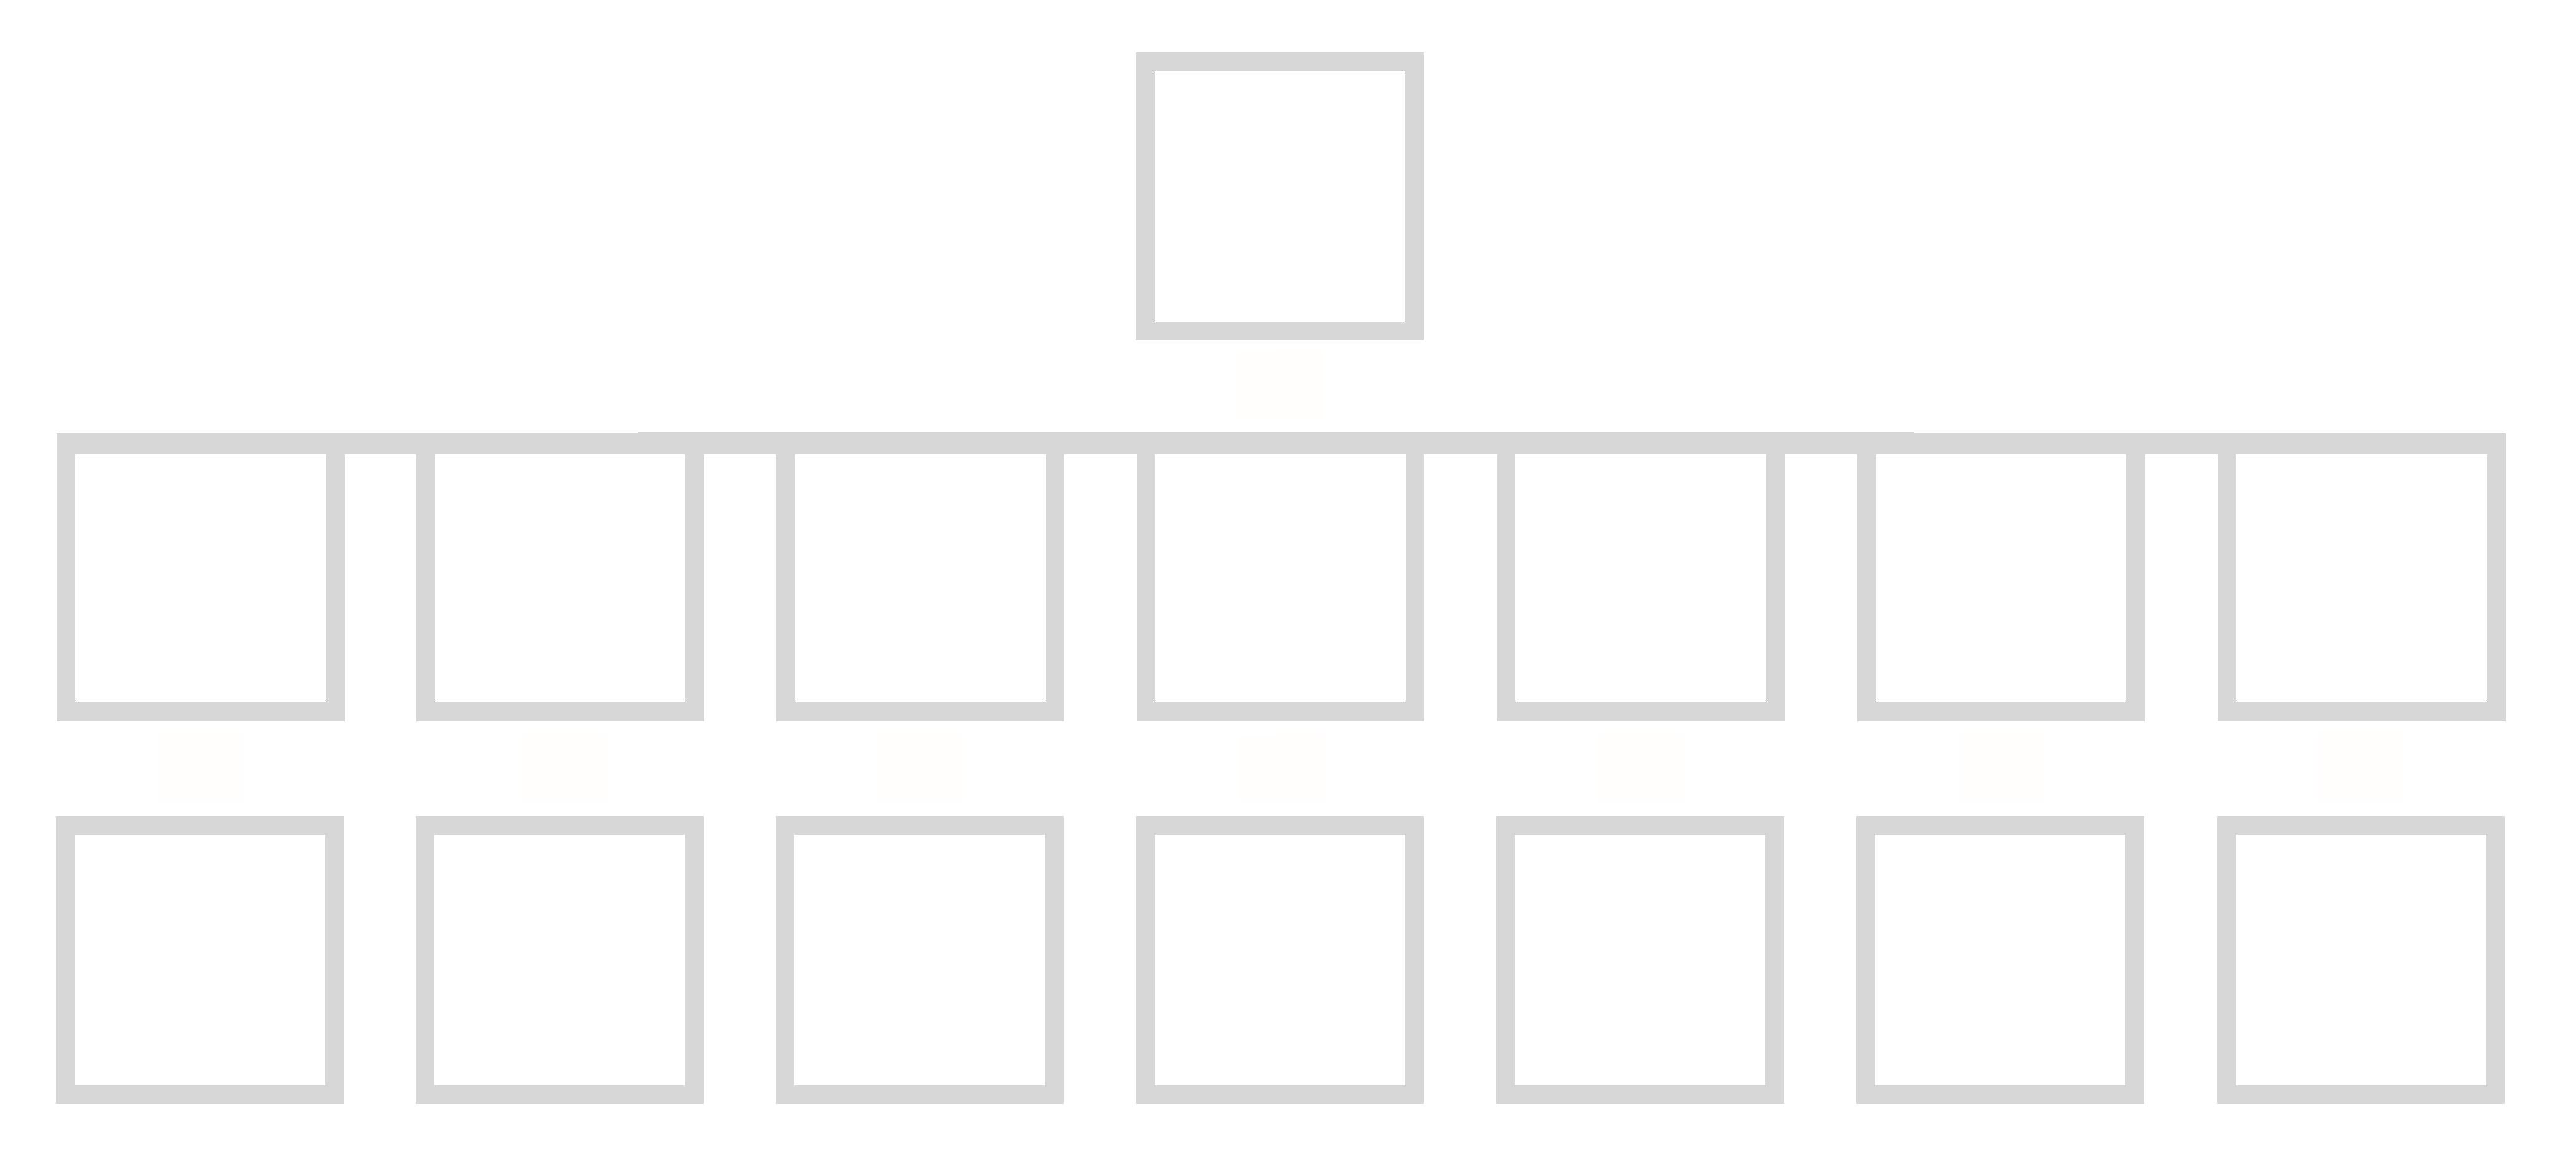 web_org_chart_INVERSED